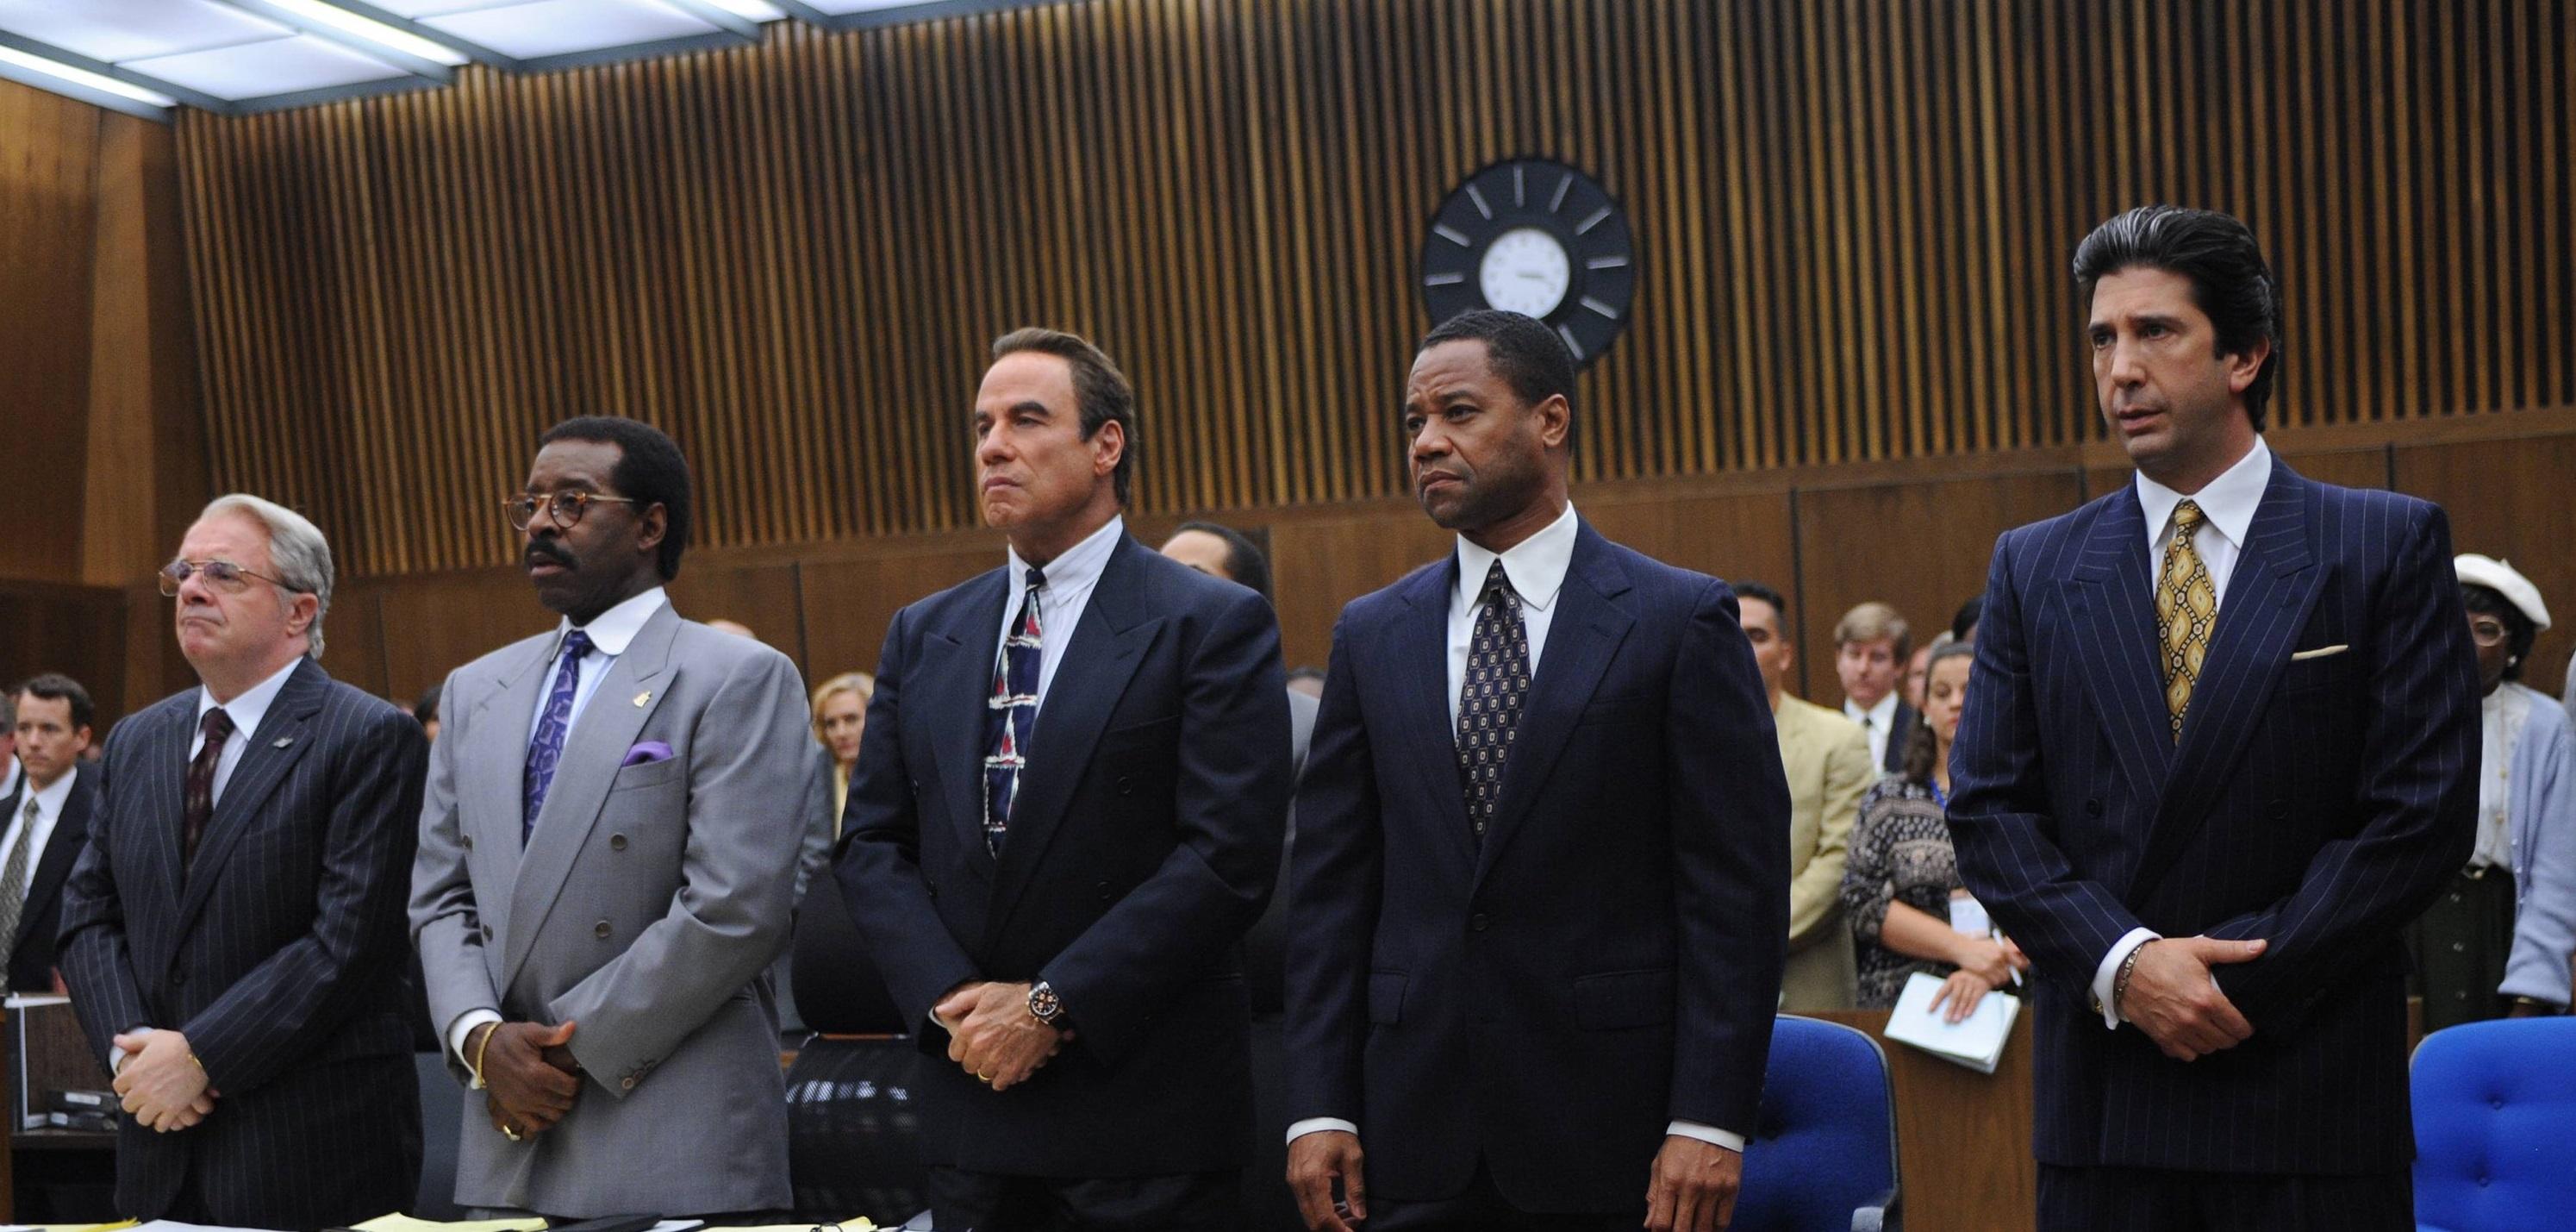 ¿Qué podés ver hoy? American Crime Story: The People v. O.J. Simpson - Radio Cantilo